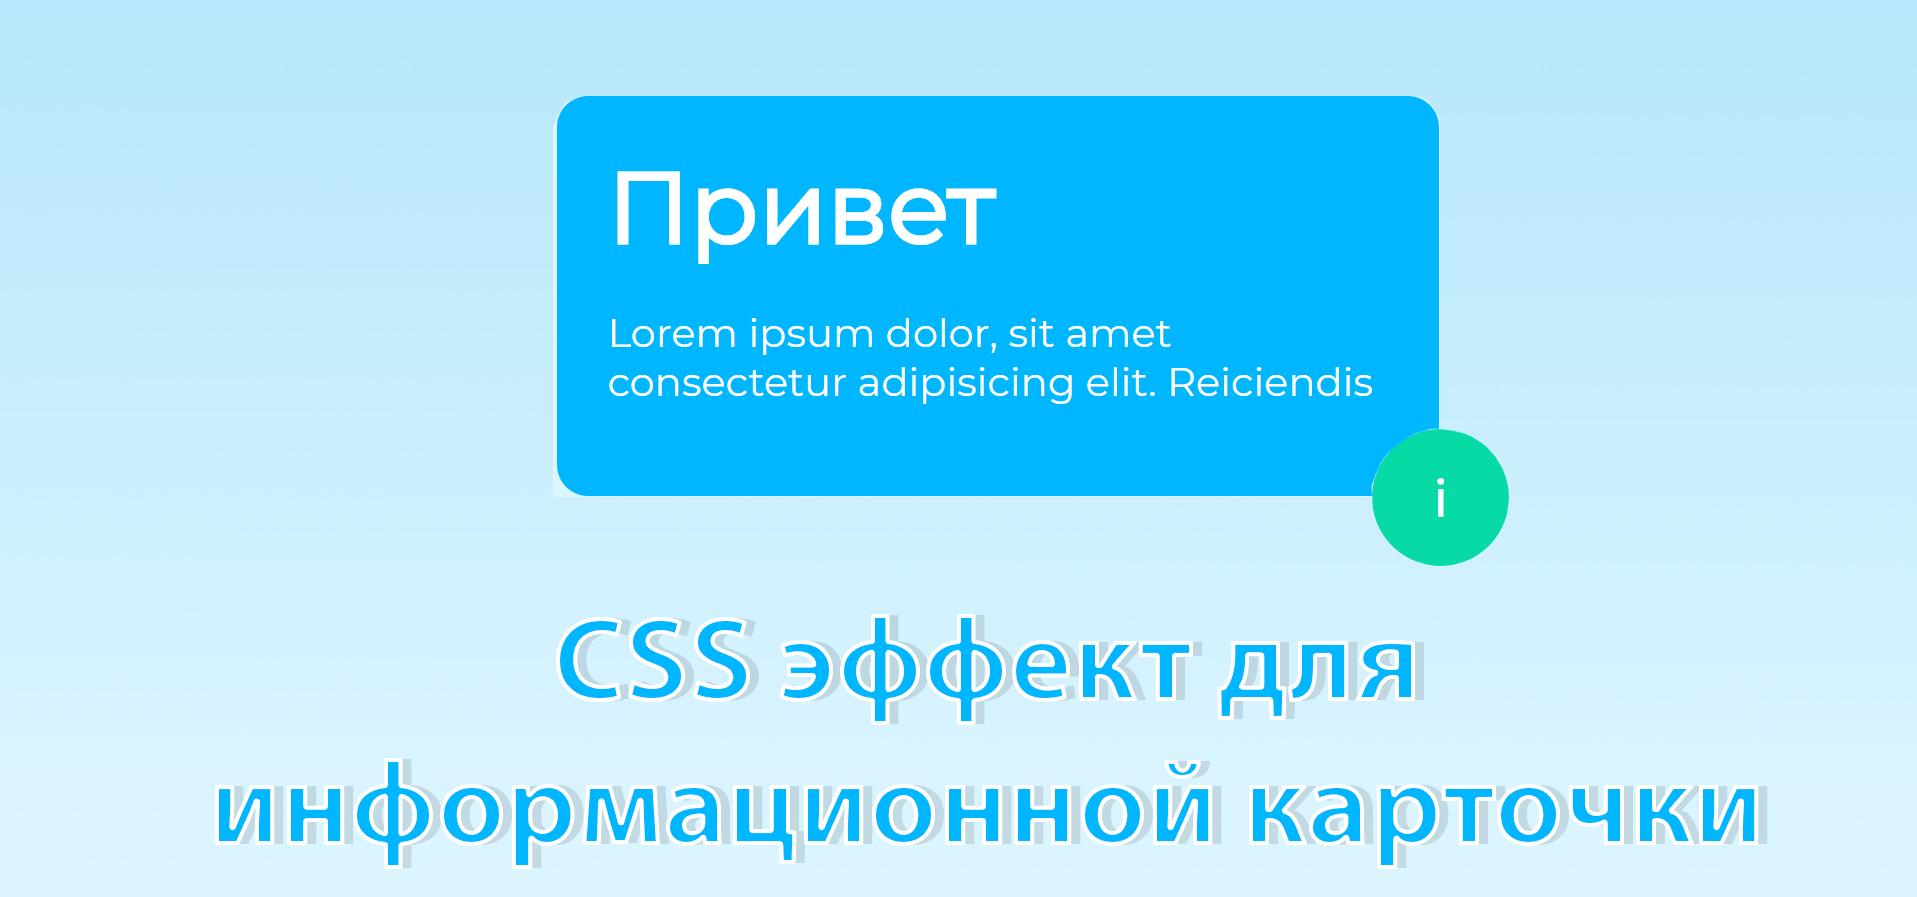 CSS эффект